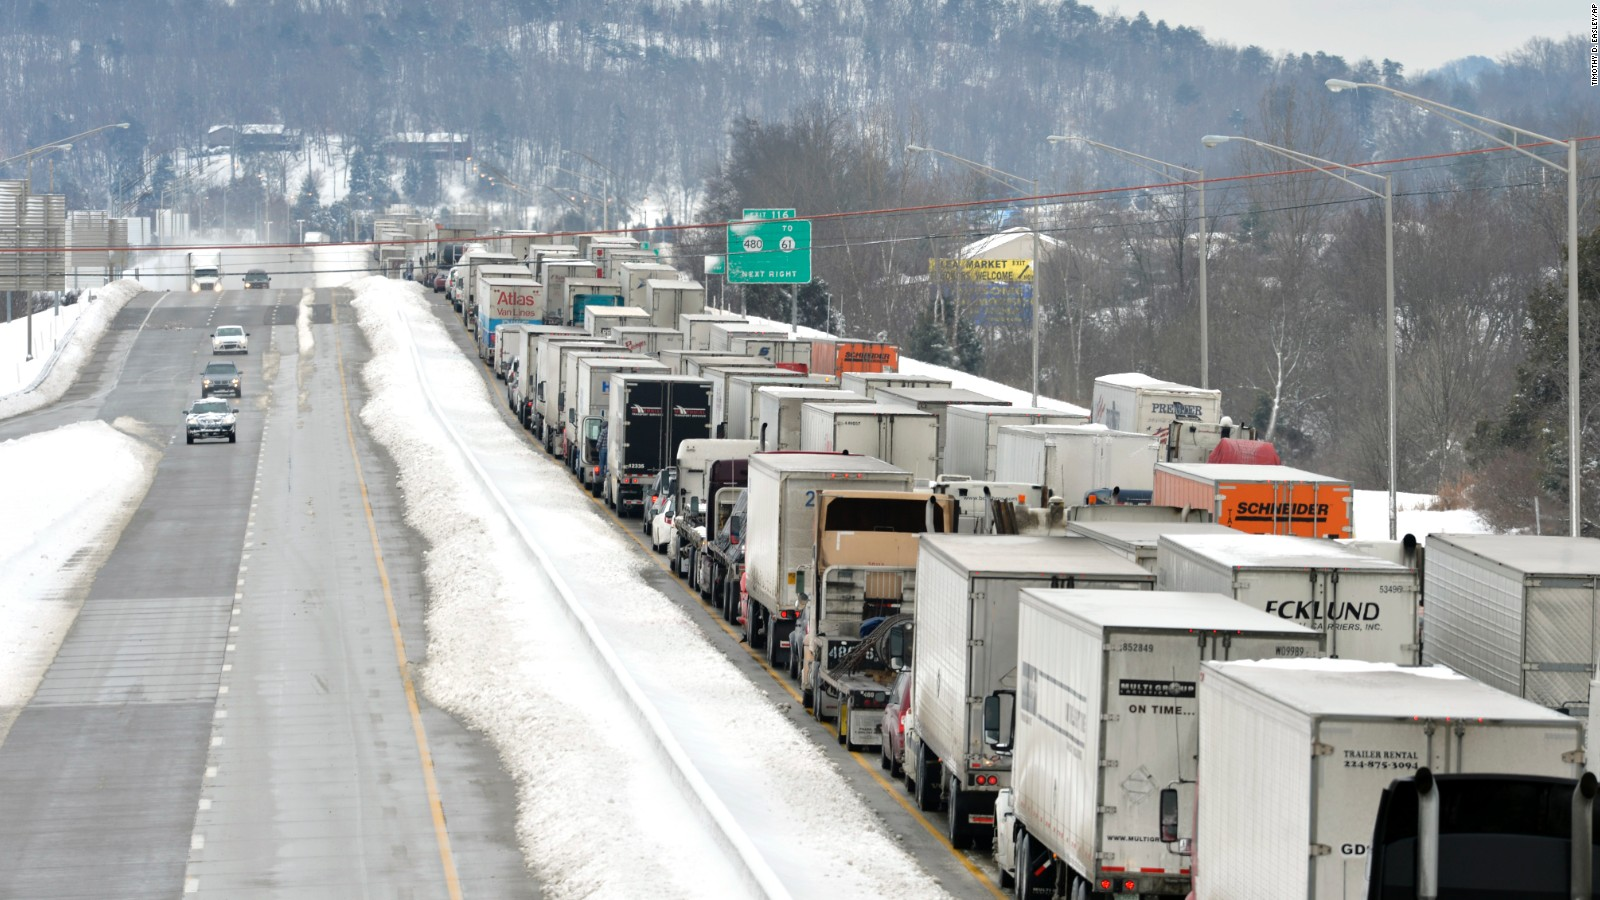 Winter storm strands motorists, hammers Northeast